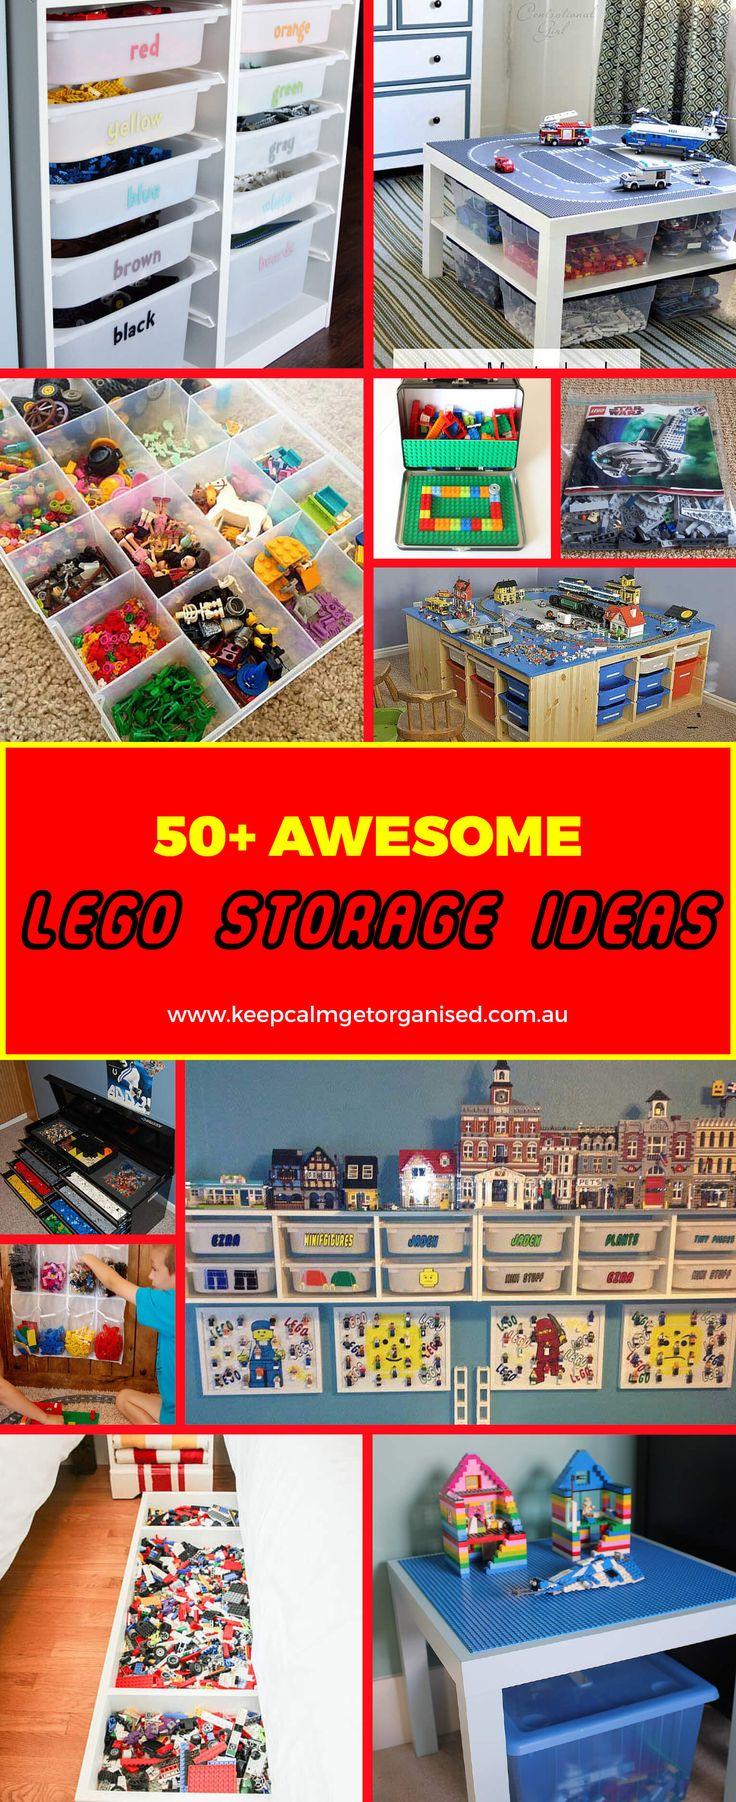 50+ Awesome Lego storage ideas